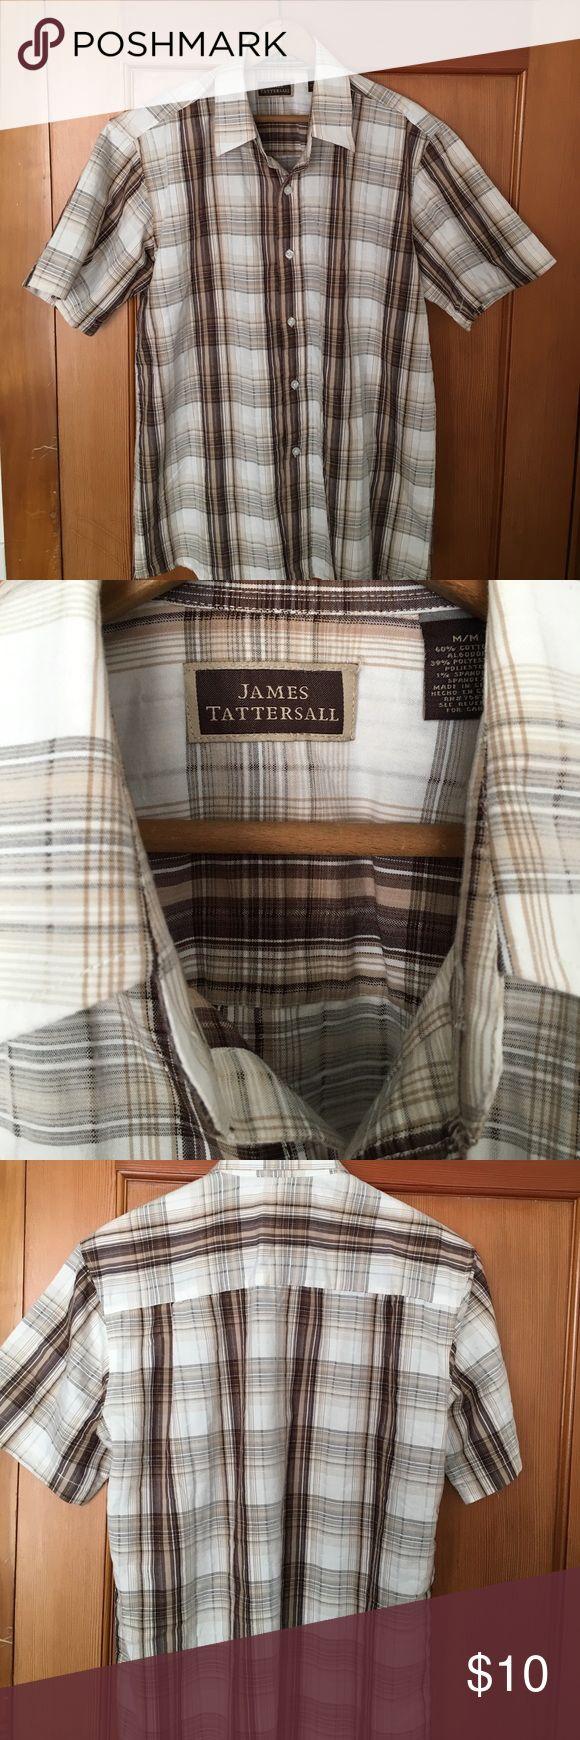 👨🏻Men's James Tattersall Plaid shirt Men's medium shirt sleeve Plaid shirt. Brown/white/cream Plaid. Perfect for summer. Very good condition. james Tattersall Shirts Casual Button Down Shirts